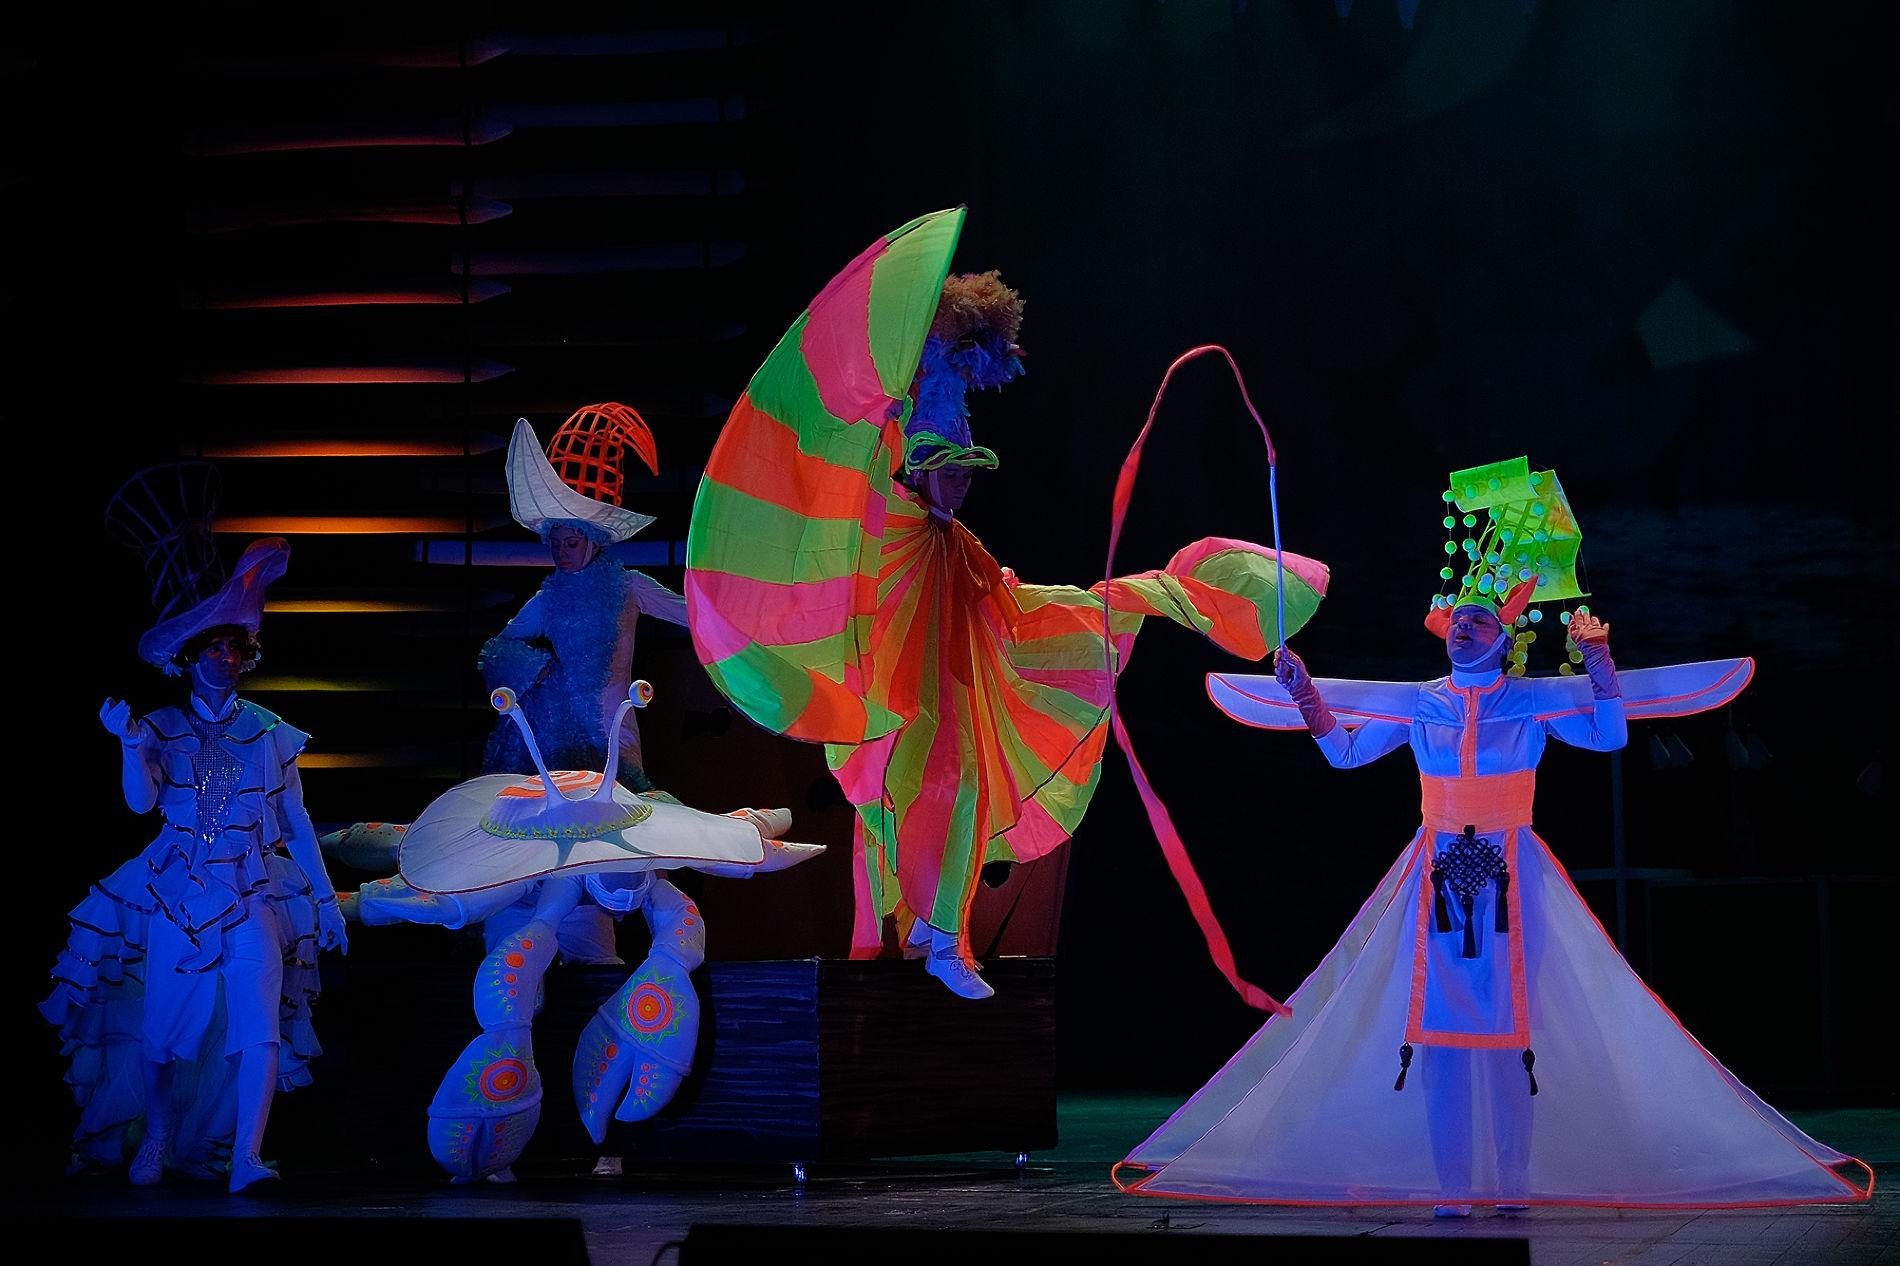 Кадр из спектакля «Алиса в Стране чудес» ©Фото Николая Хижняка